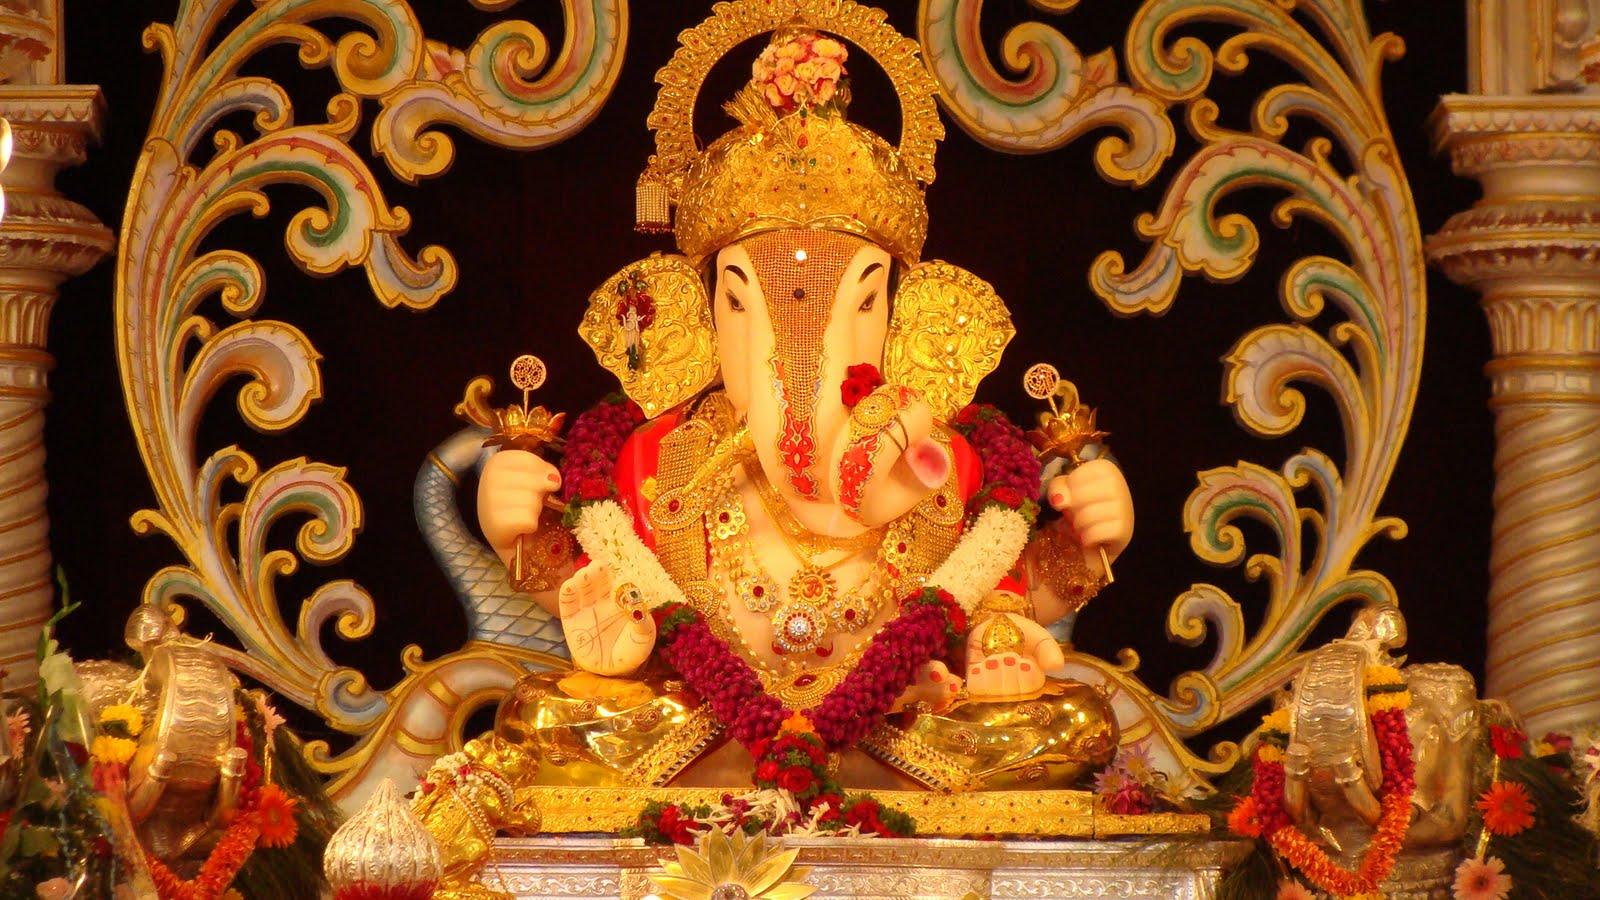 God Ganesha Hd Wallpaper Free Download Powermall